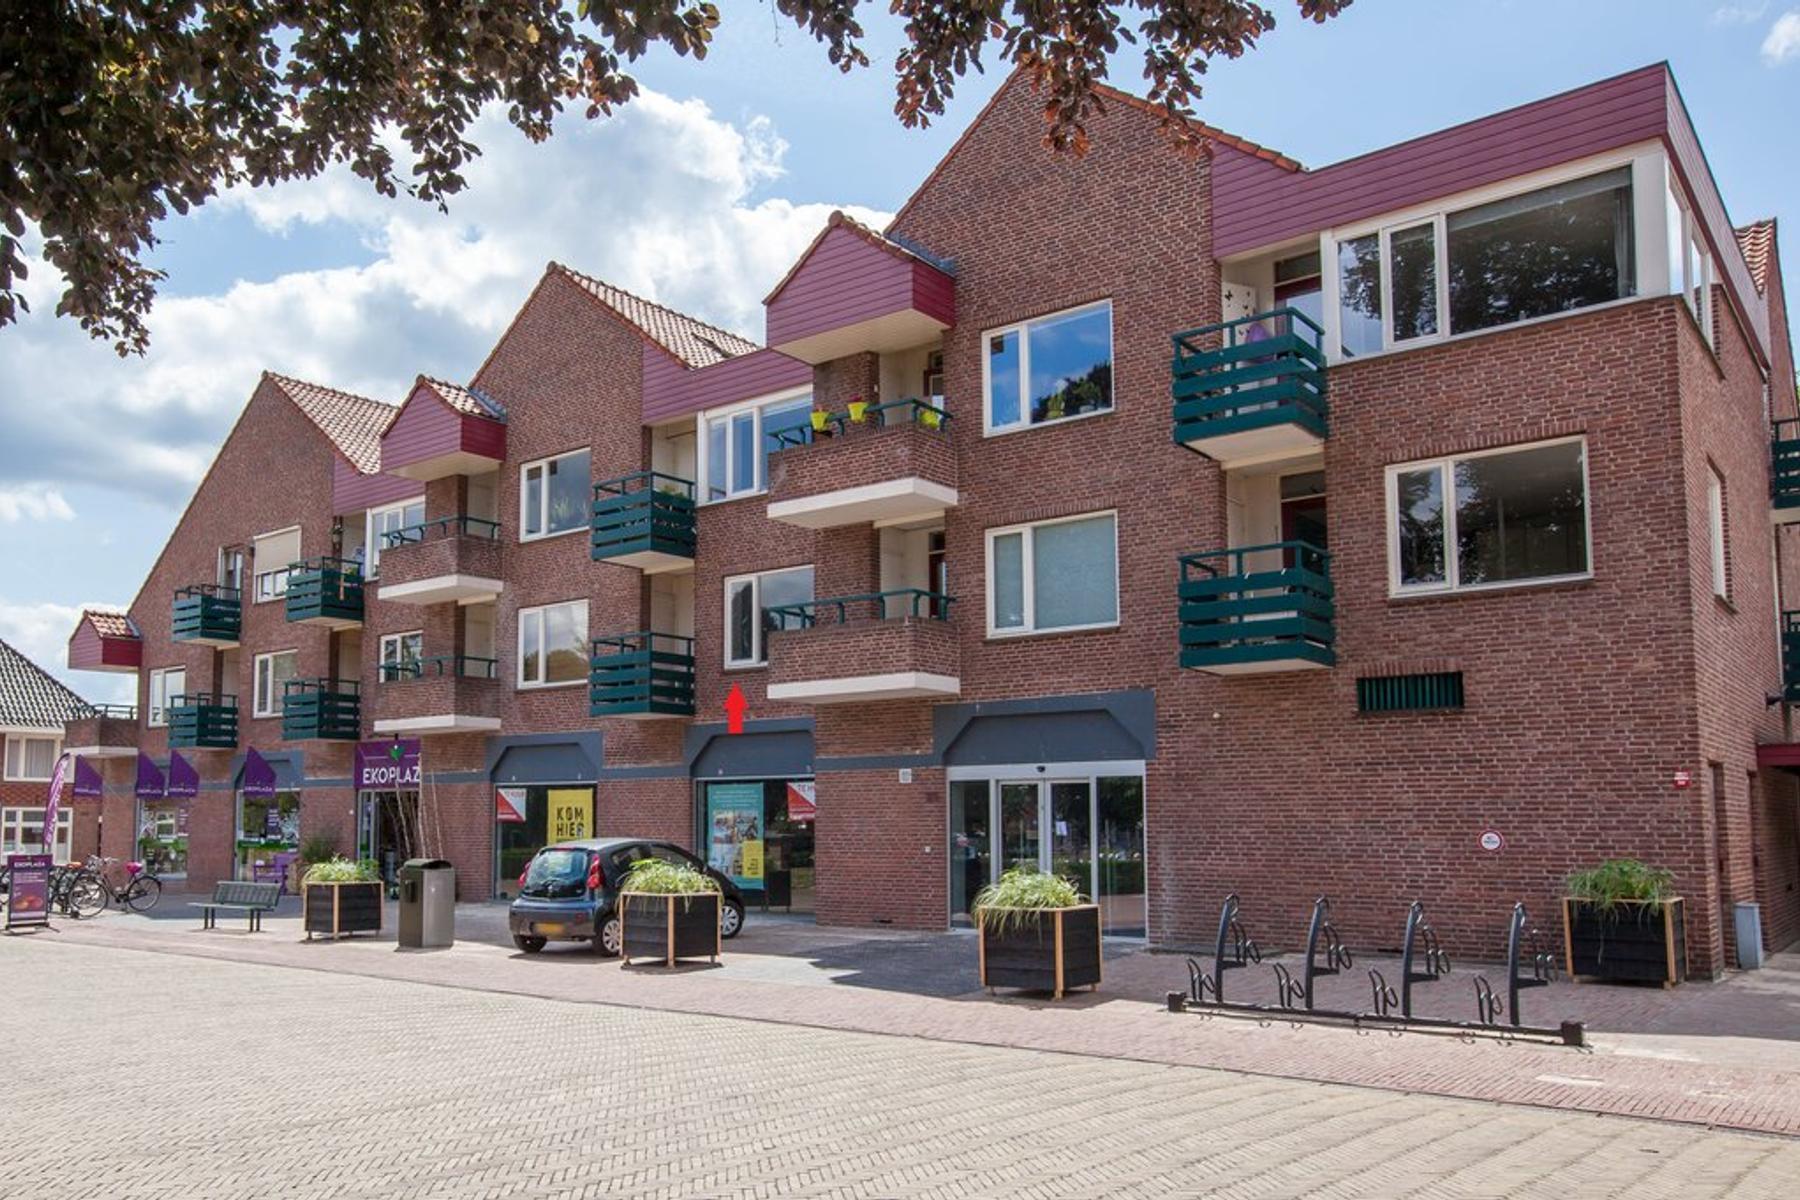 Roelvinkstraat 45 in Winterswijk 7101 GN